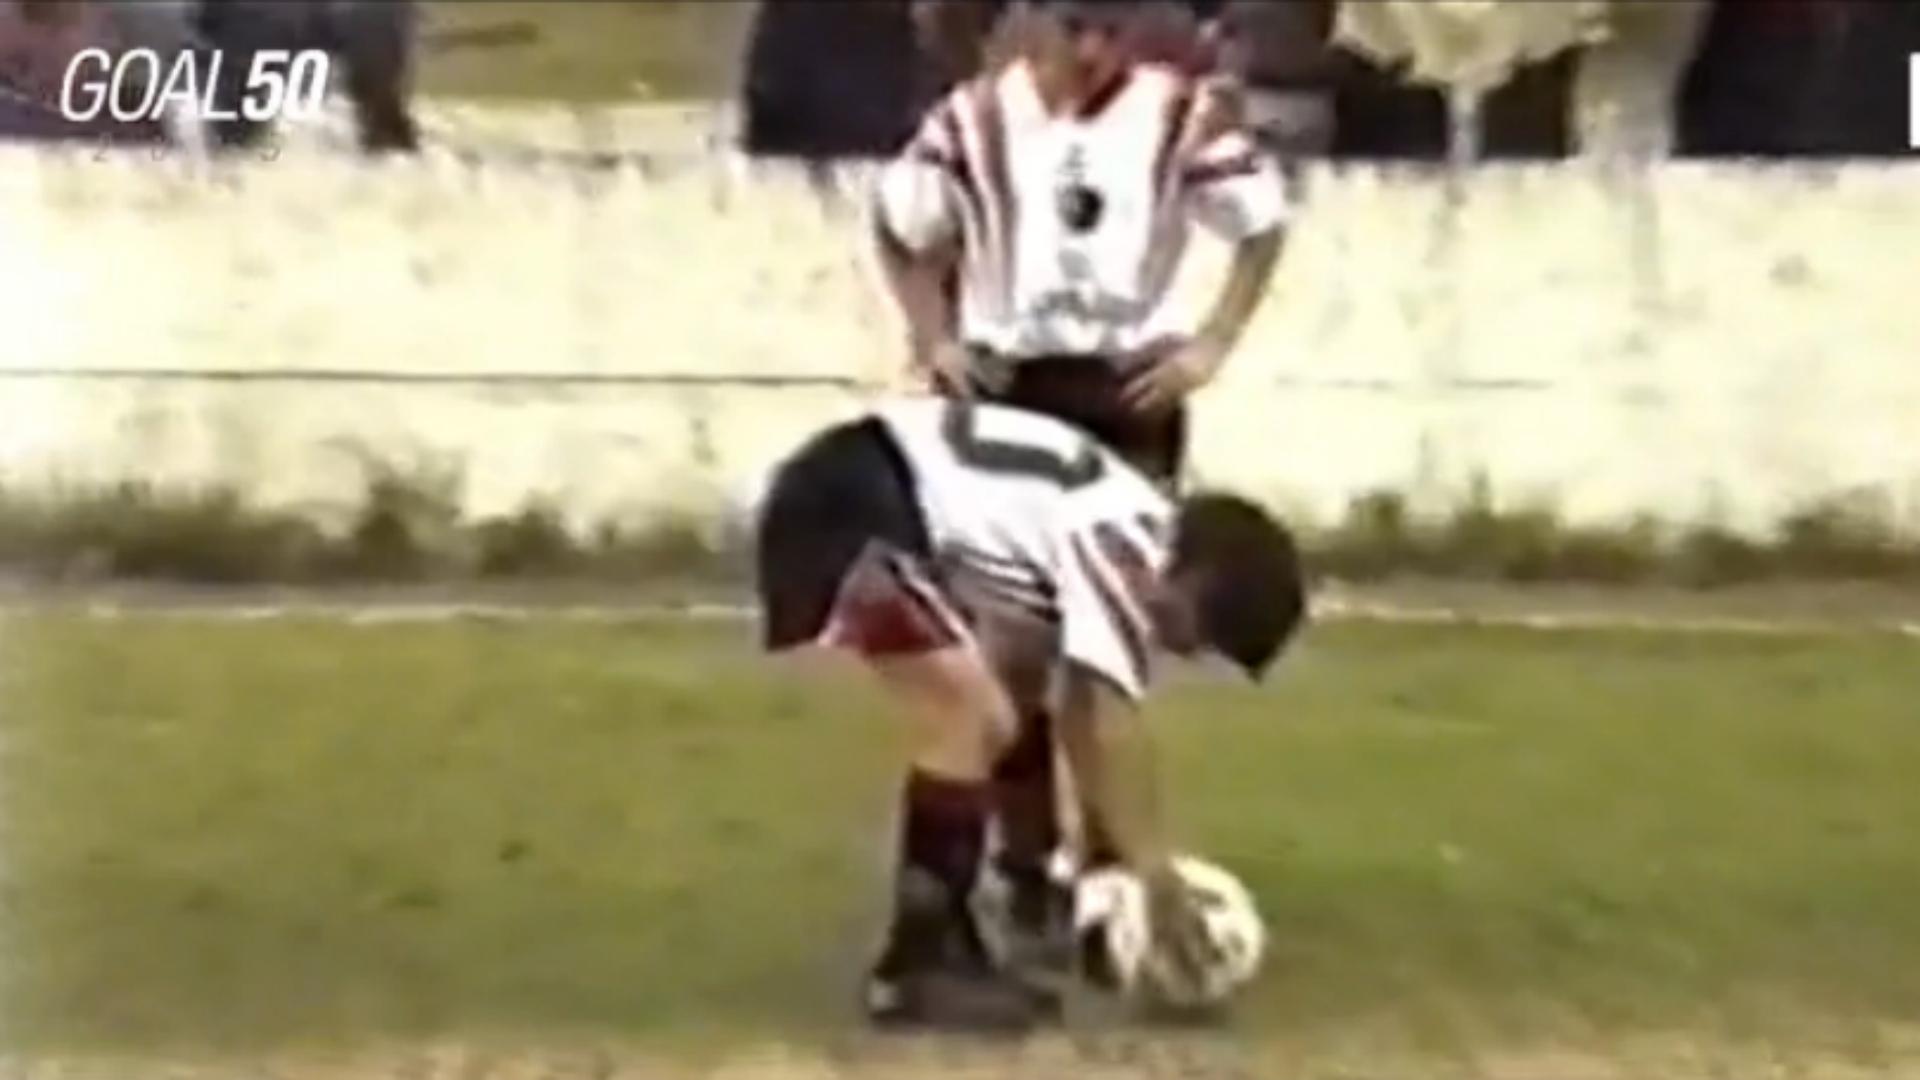 Messis Great Nemesis Rosario Central Goalcom